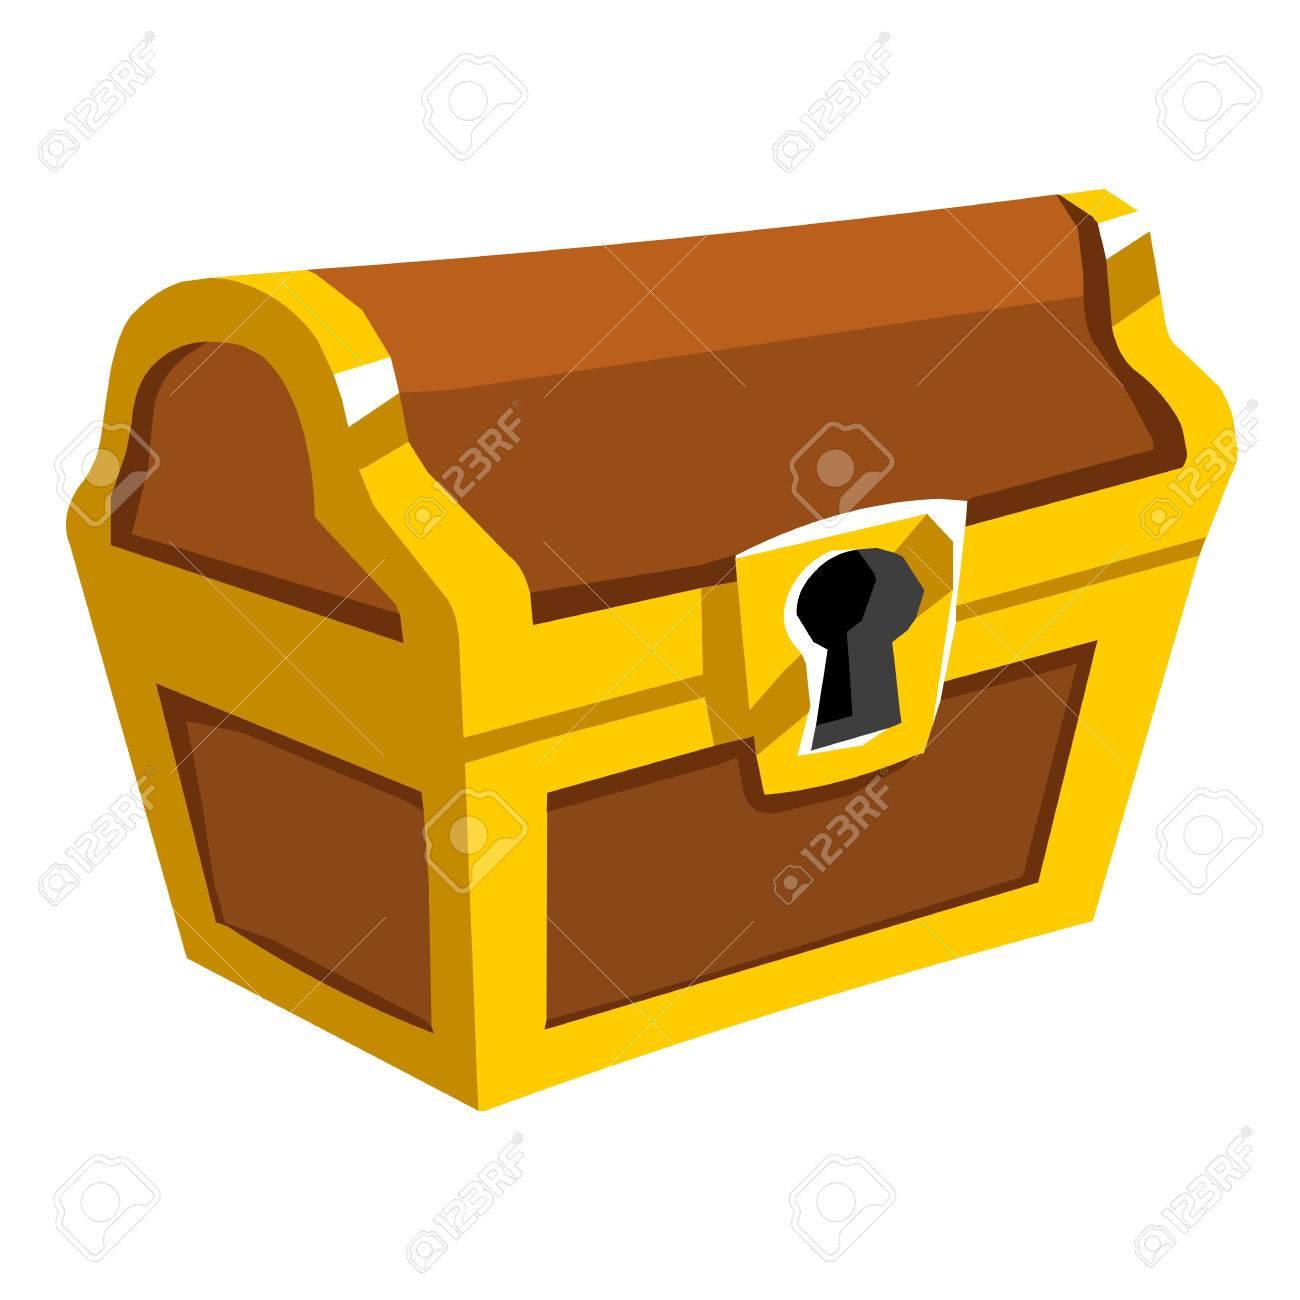 treasure chest isolated illustration on white background royalty rh 123rf com treasure chest vector free download pirate treasure chest vector